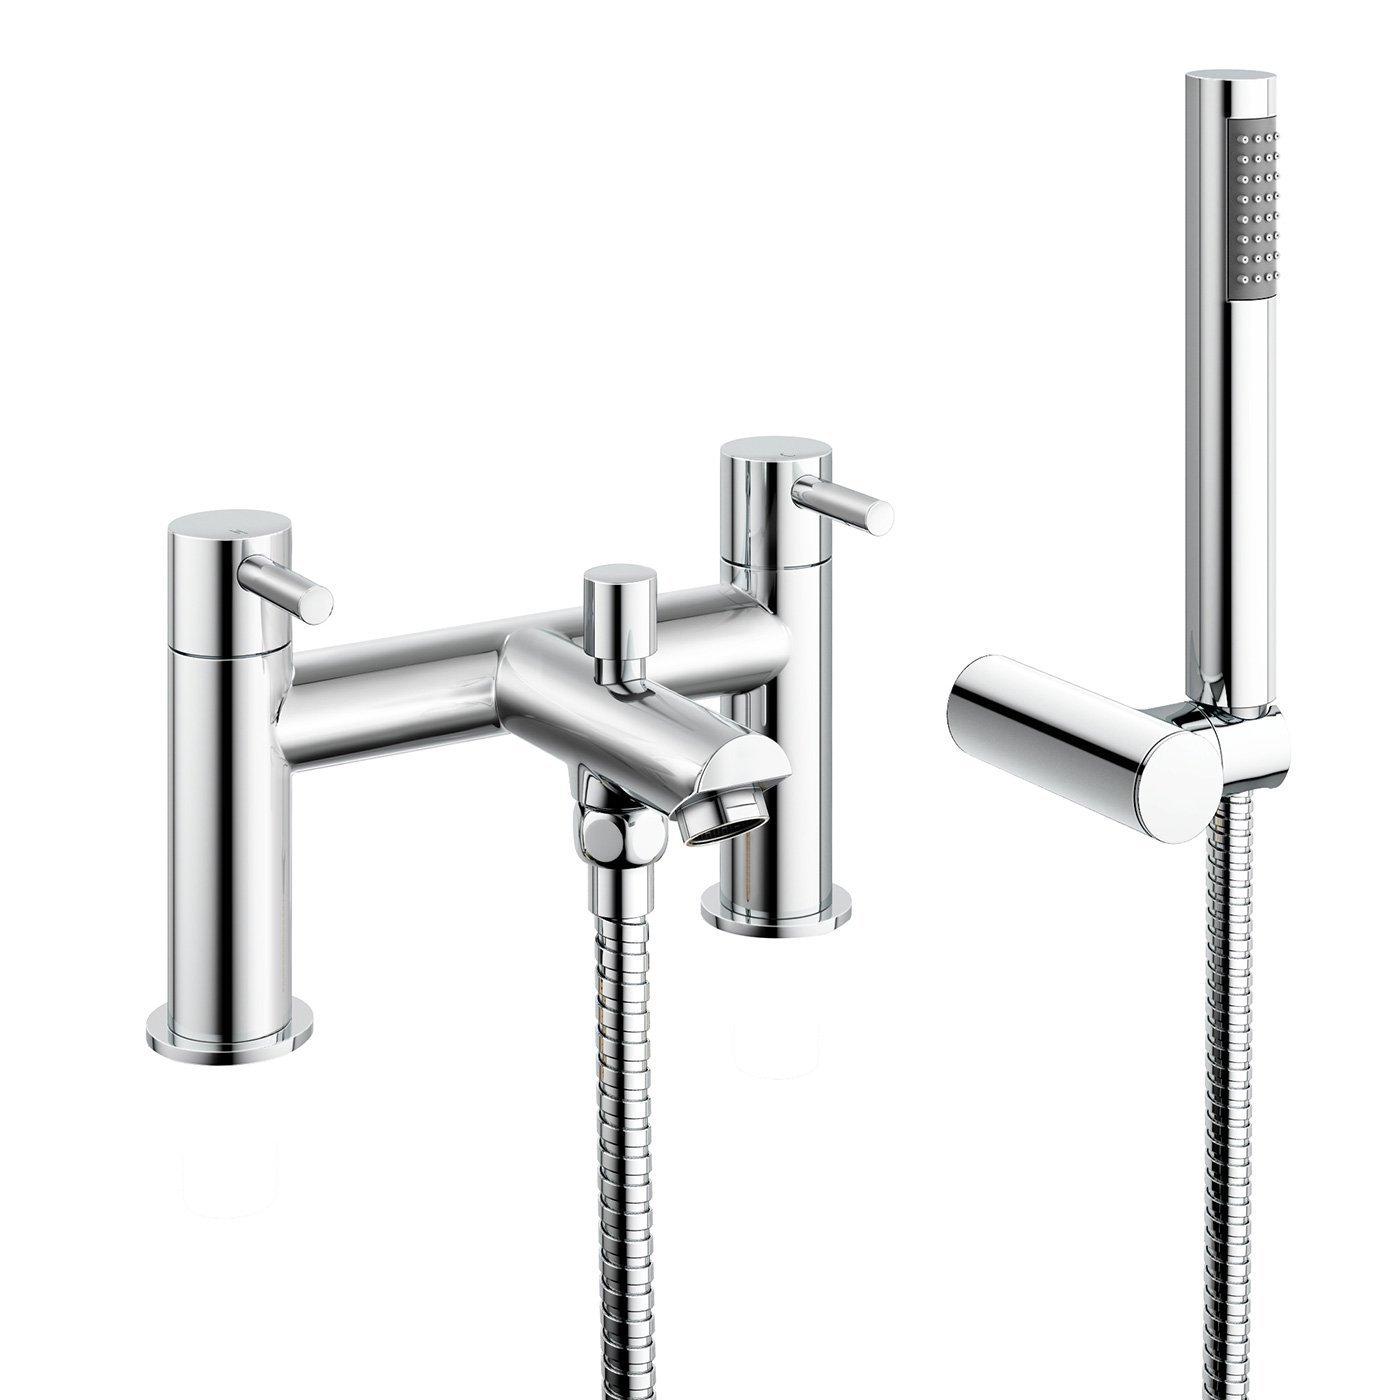 iBathUK Luxury Bath Filler Mixer Tap with Modern Bathroom Shower Head TB3015 by iBathUK